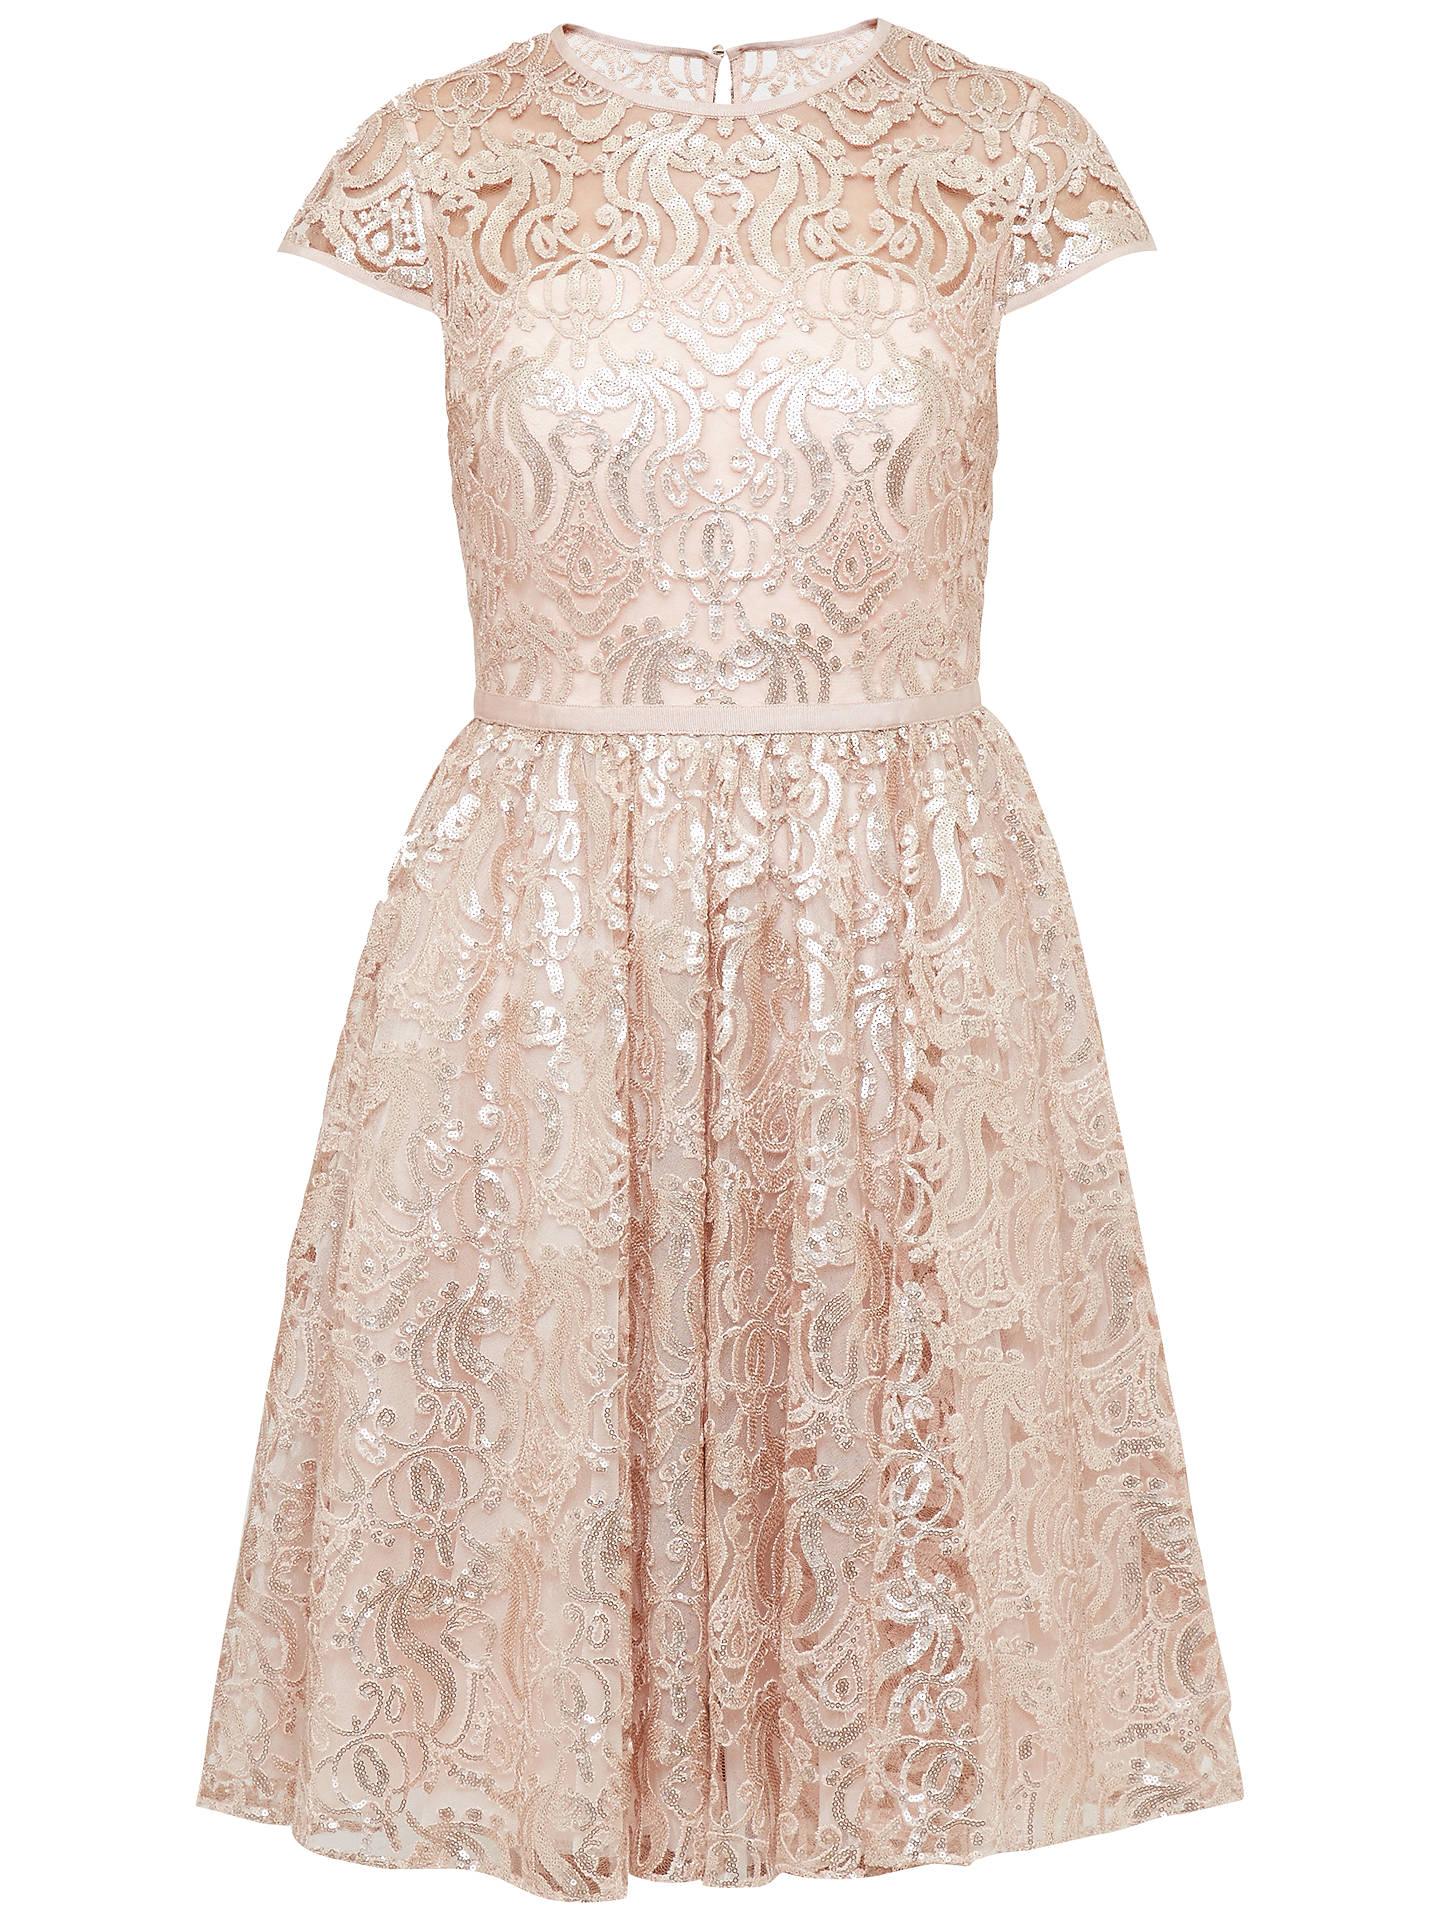 cb45a0c2ea1a Buy Ted Baker Ranita Sheer Bodice Sequin Dress